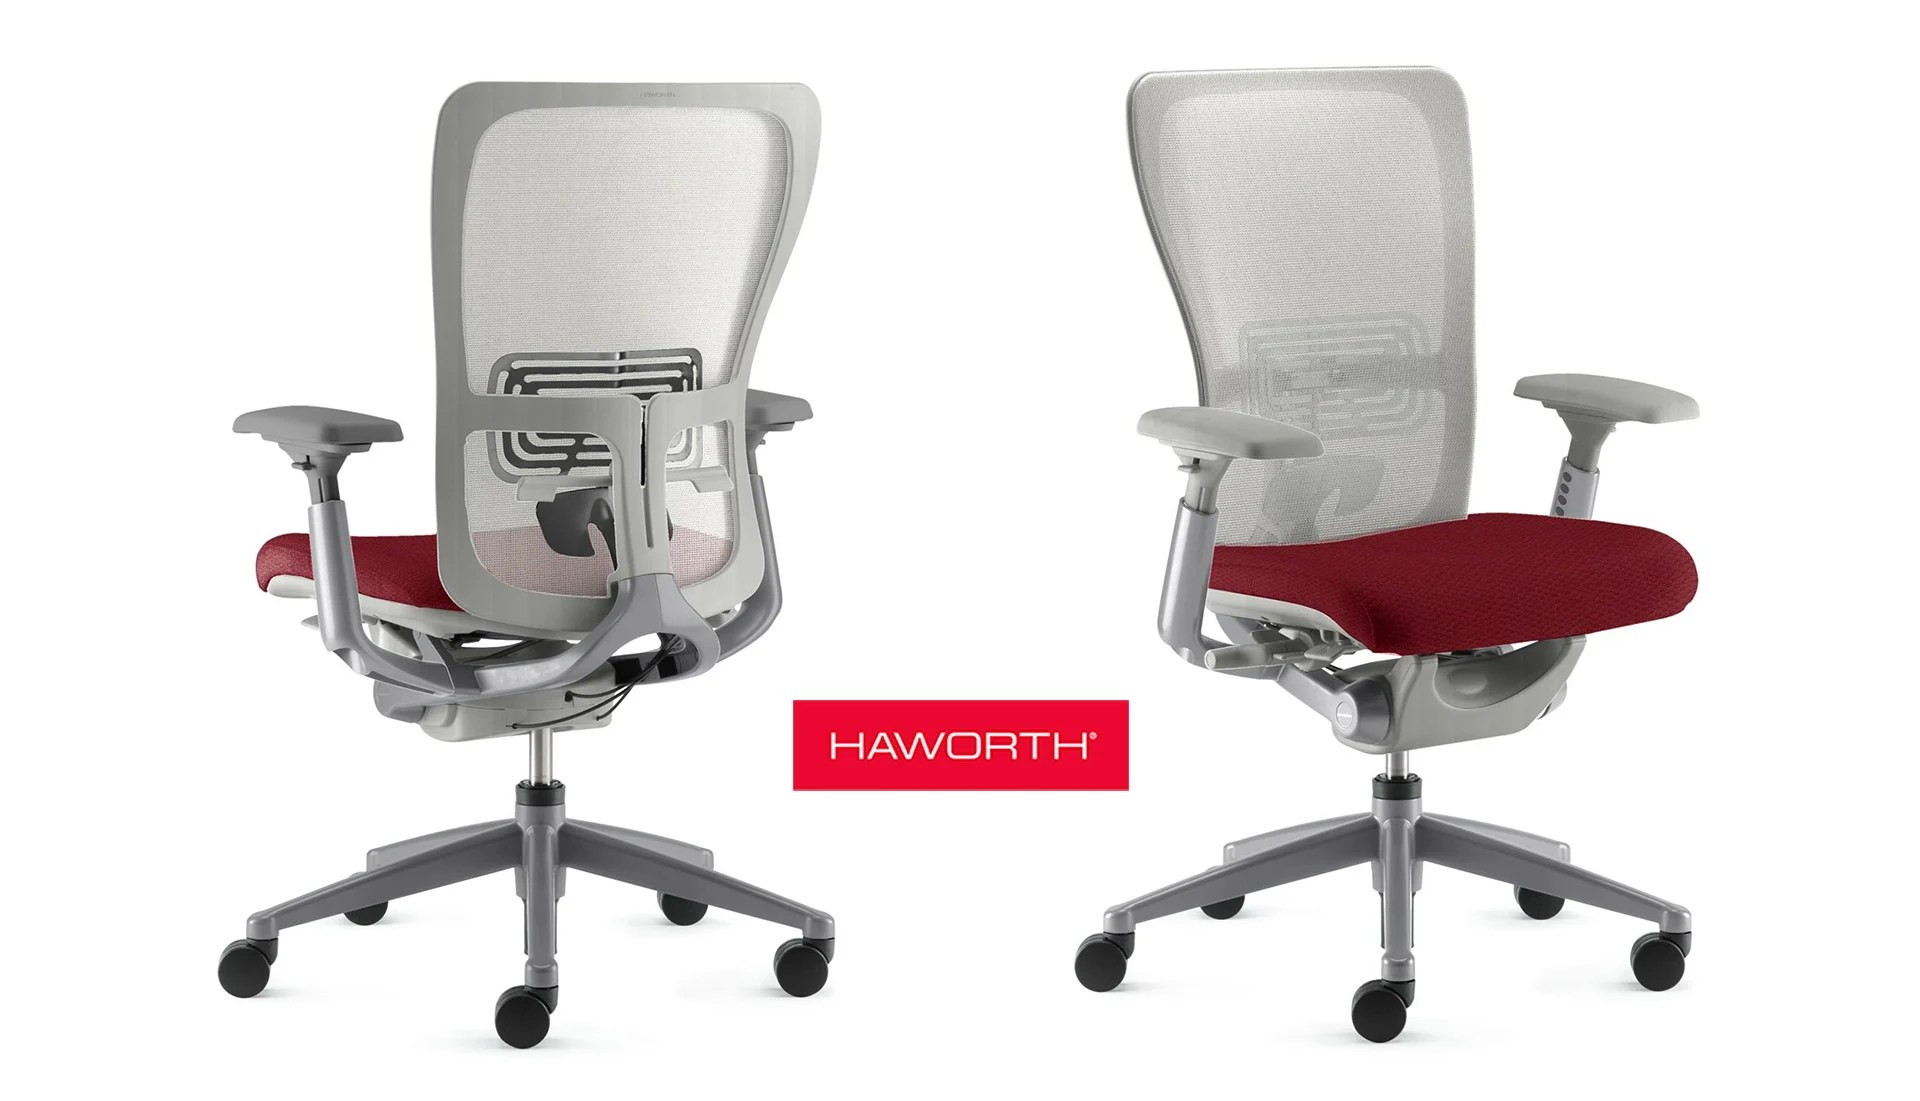 haworth zody chair leg protectors win task